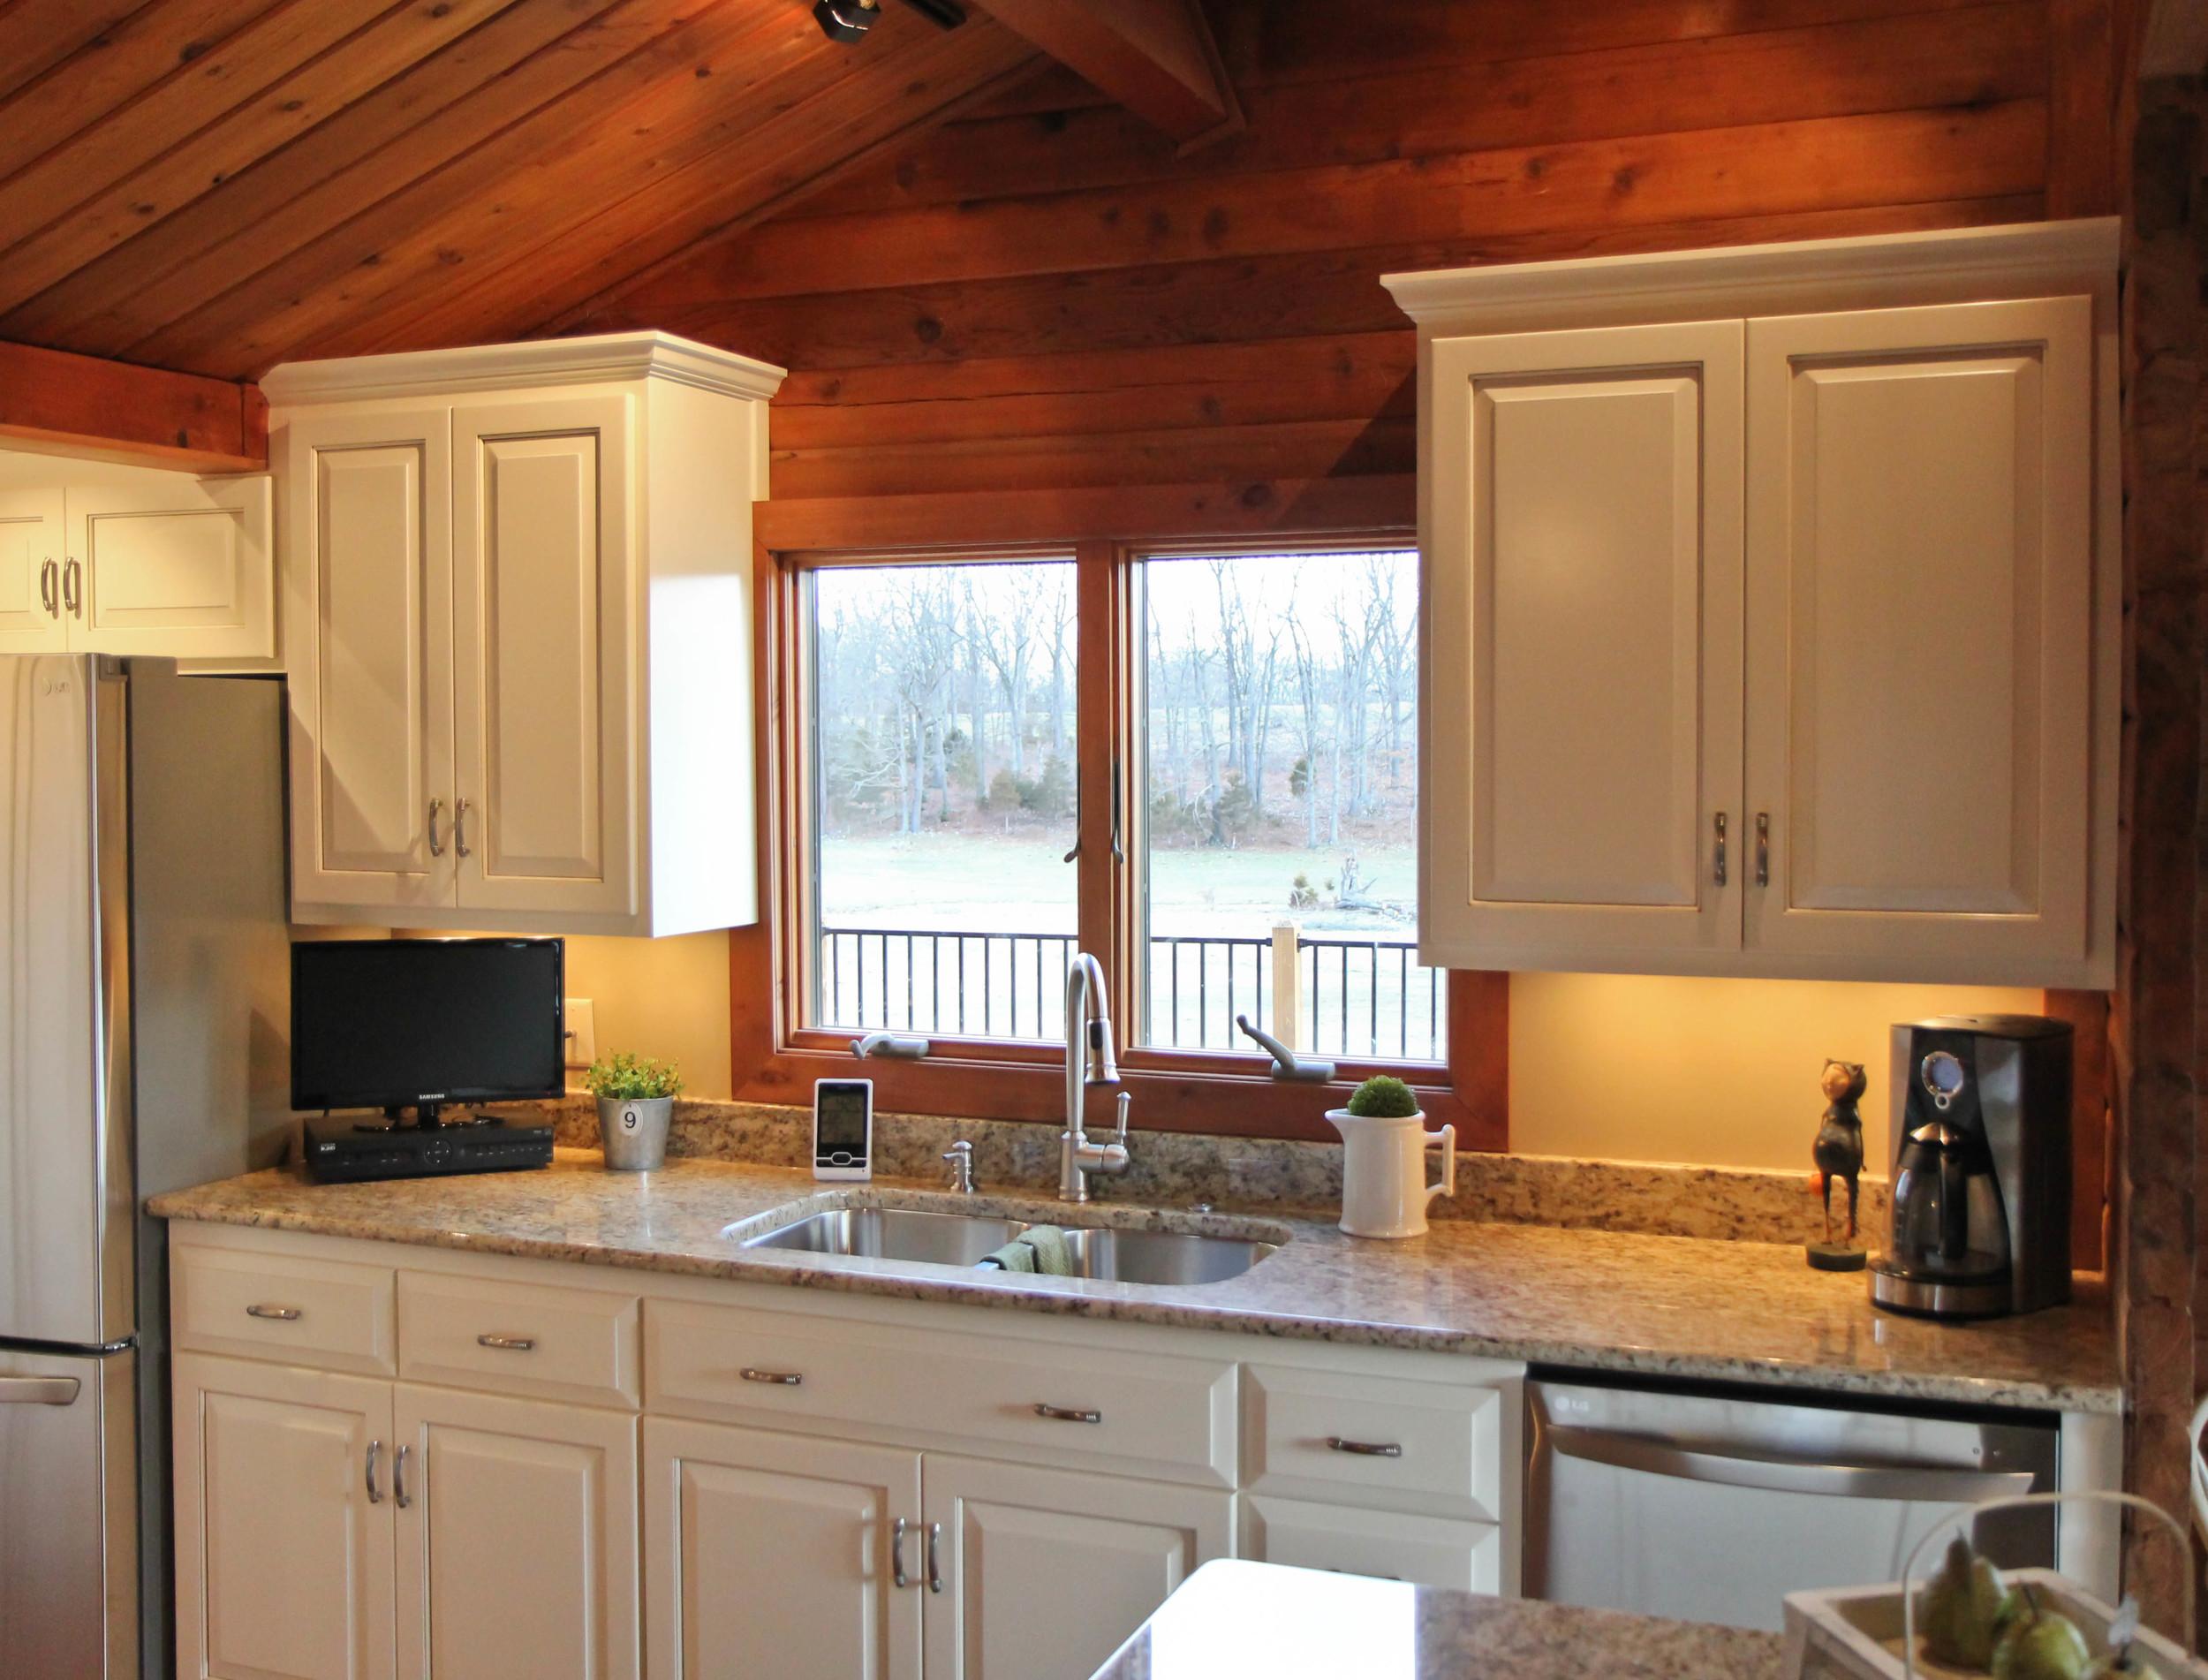 Kitchens pt 2-049.jpg